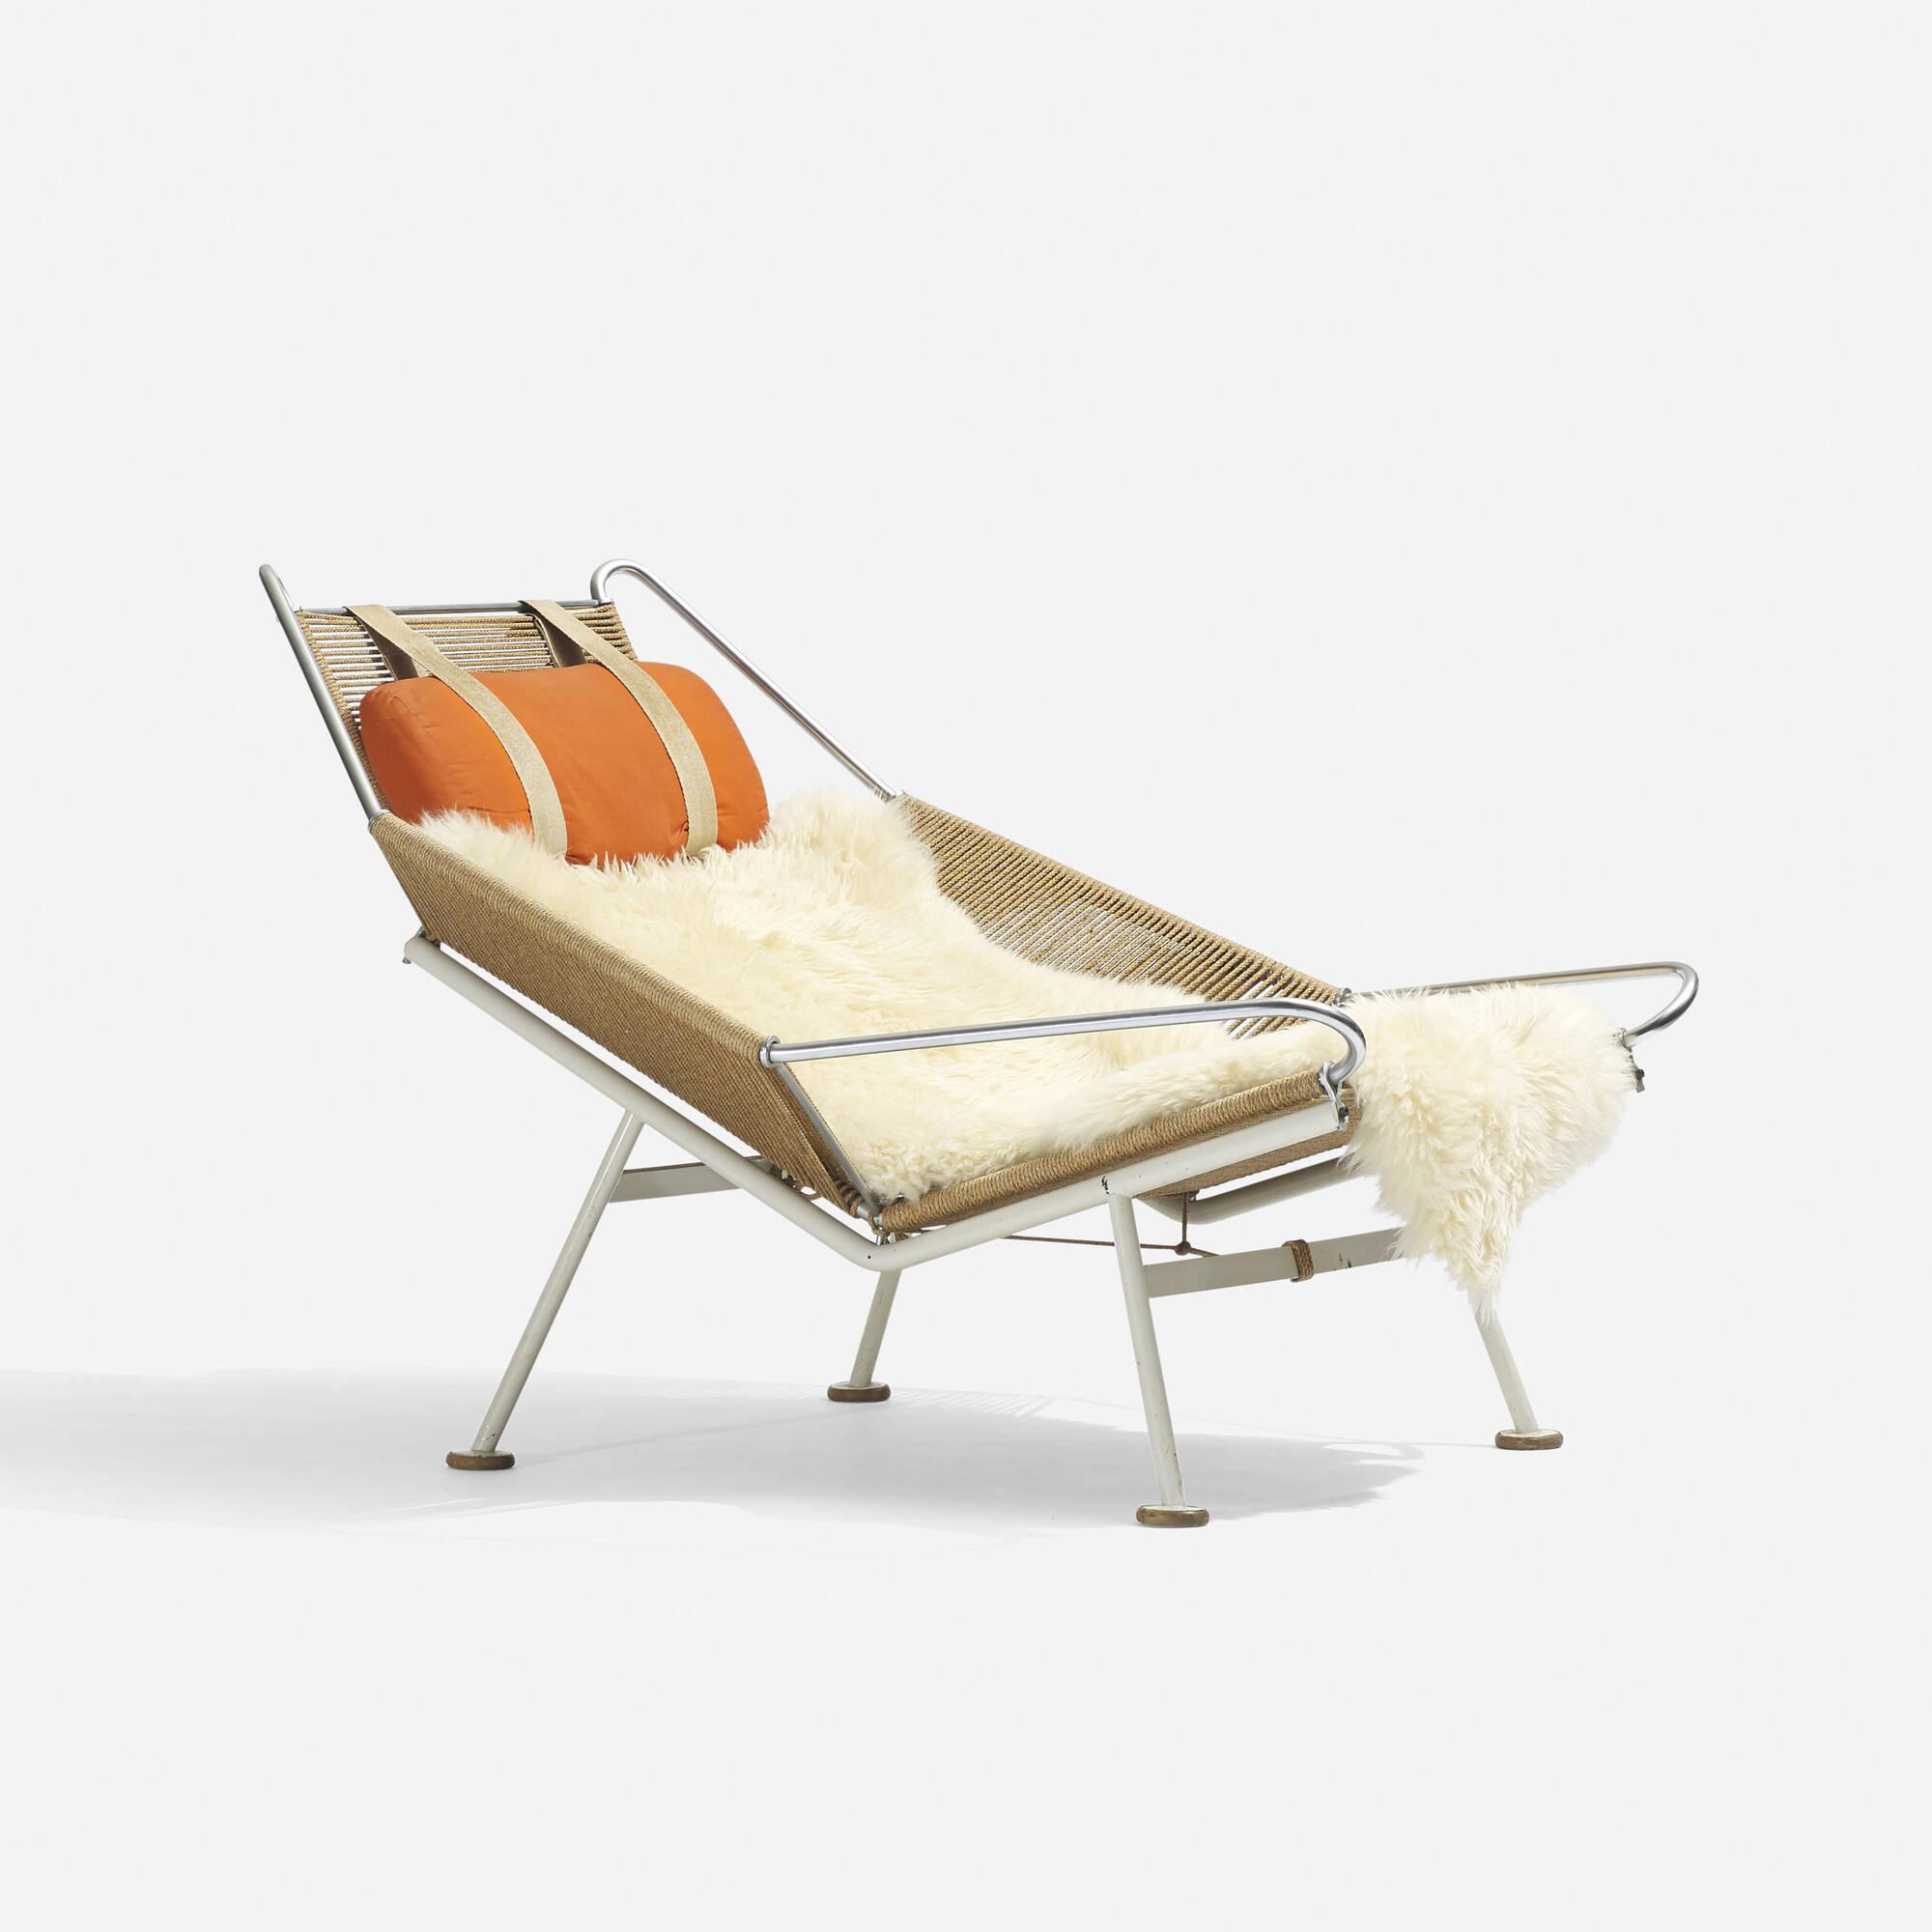 182 Hans J Wegner Flag Halyard lounge chair Scandinavian